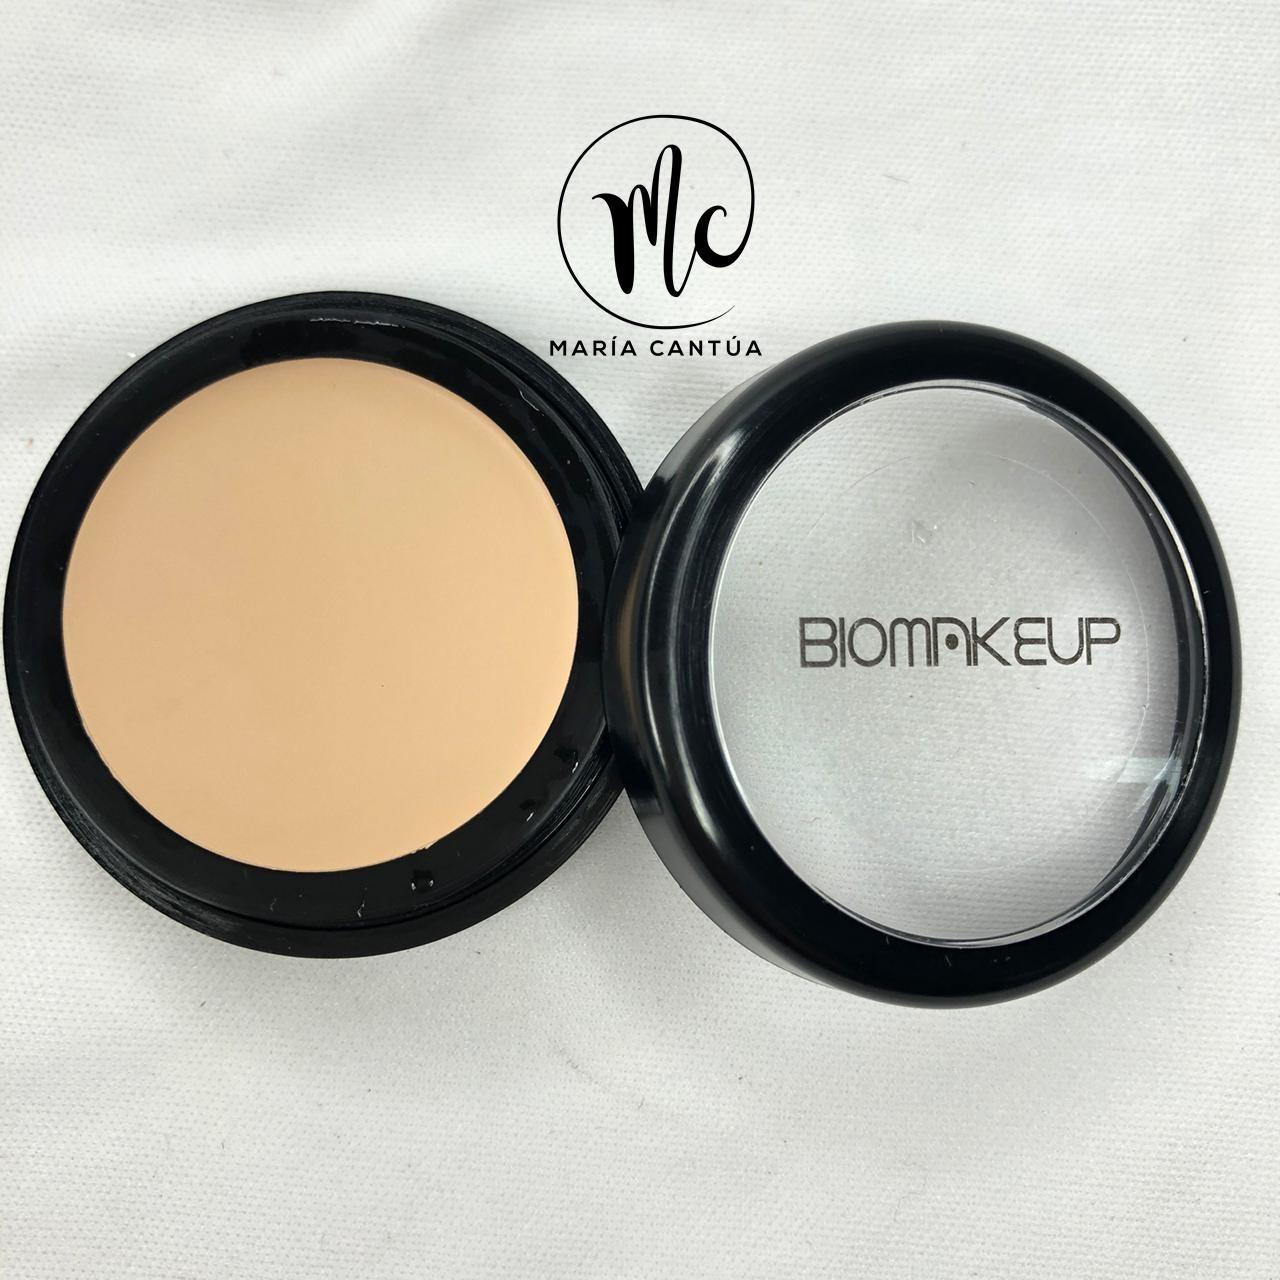 Maquillaje 10G. #0 Biomakeup